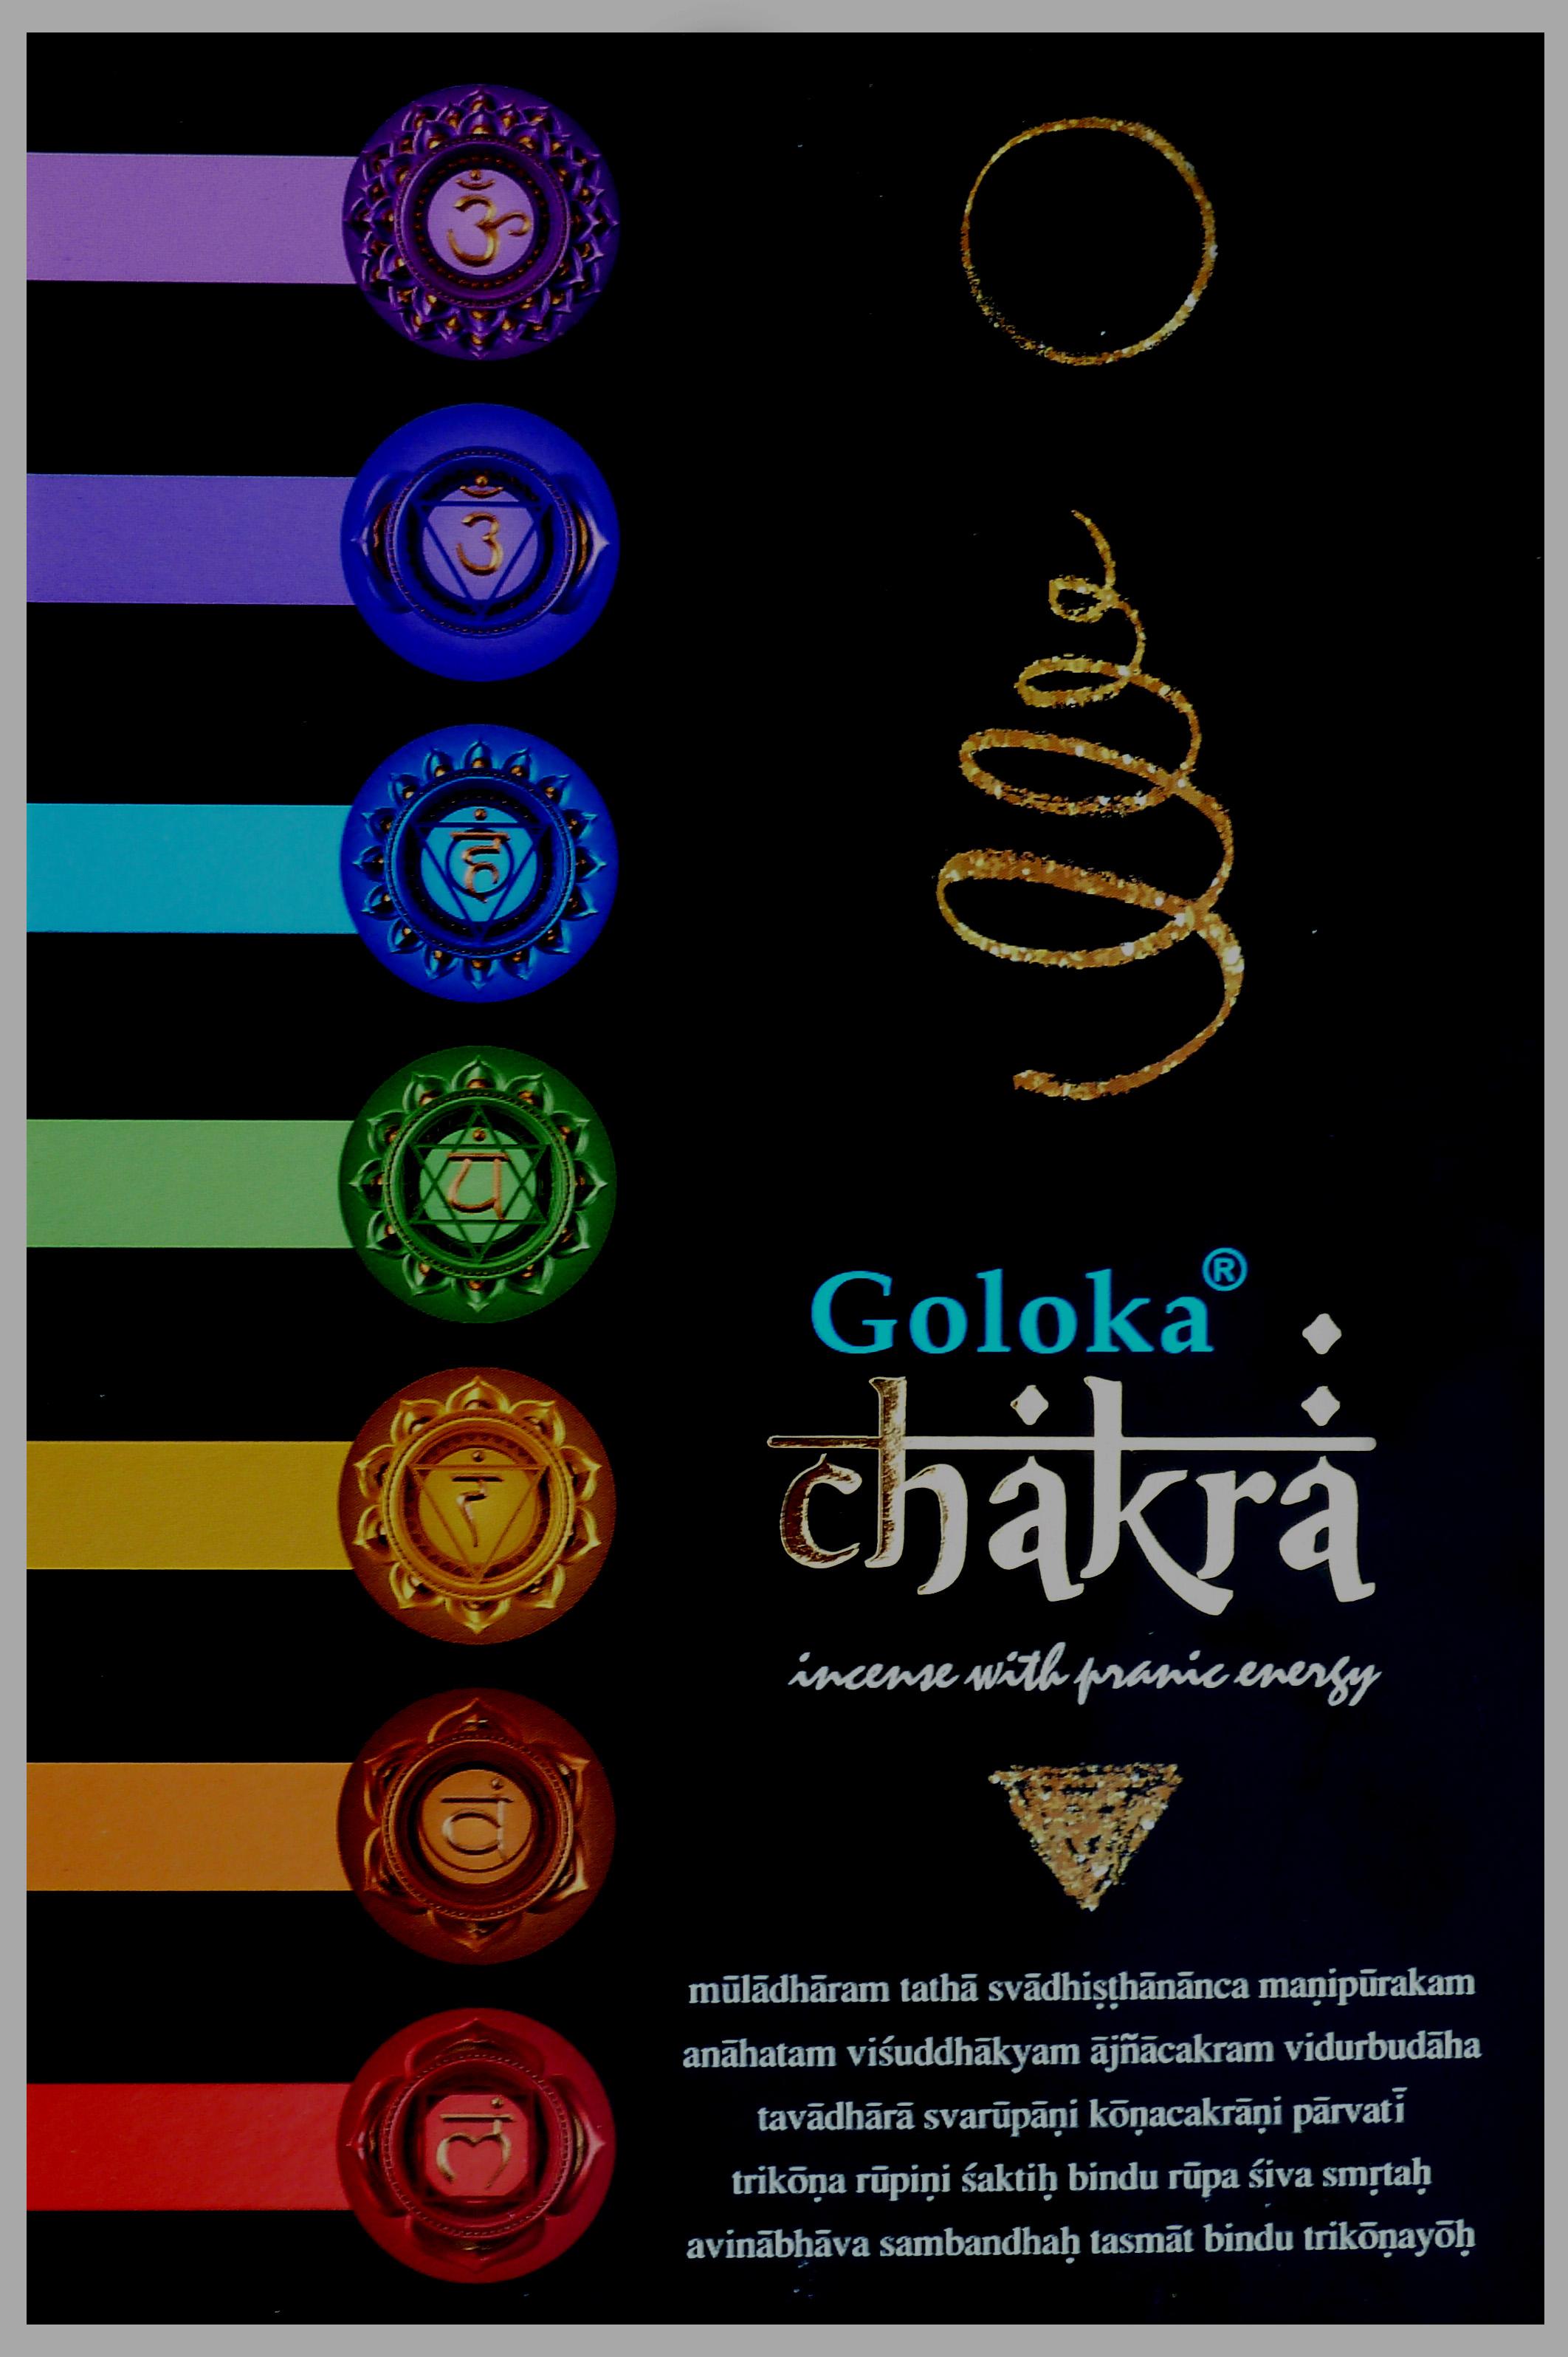 Encens Goloka black series Chakra 15g